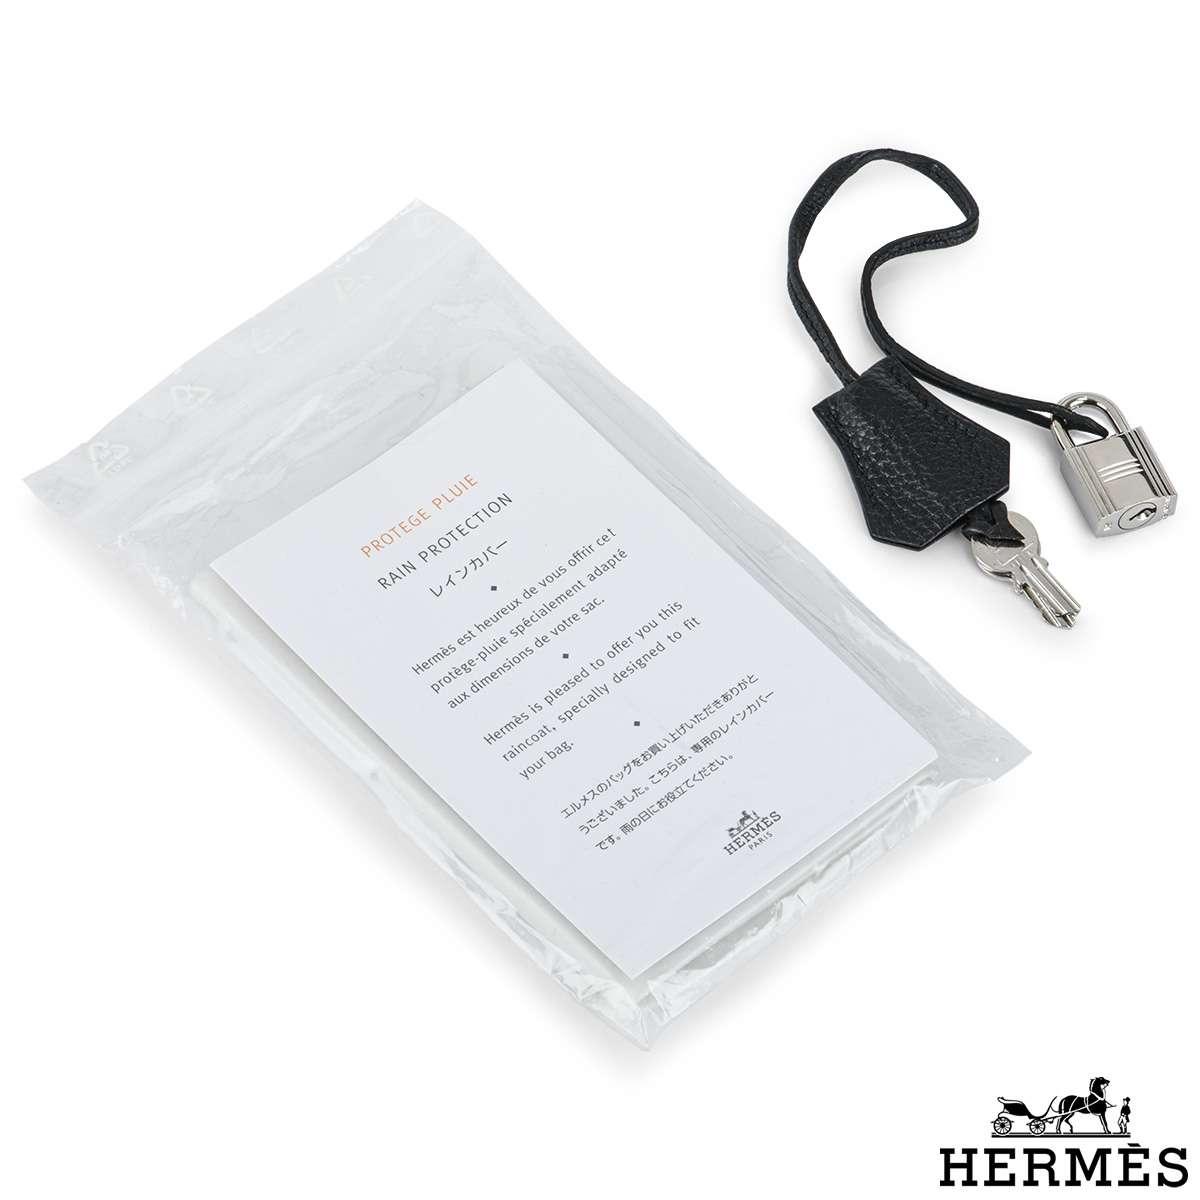 Hermès Birkin 35 Black Togo PHW